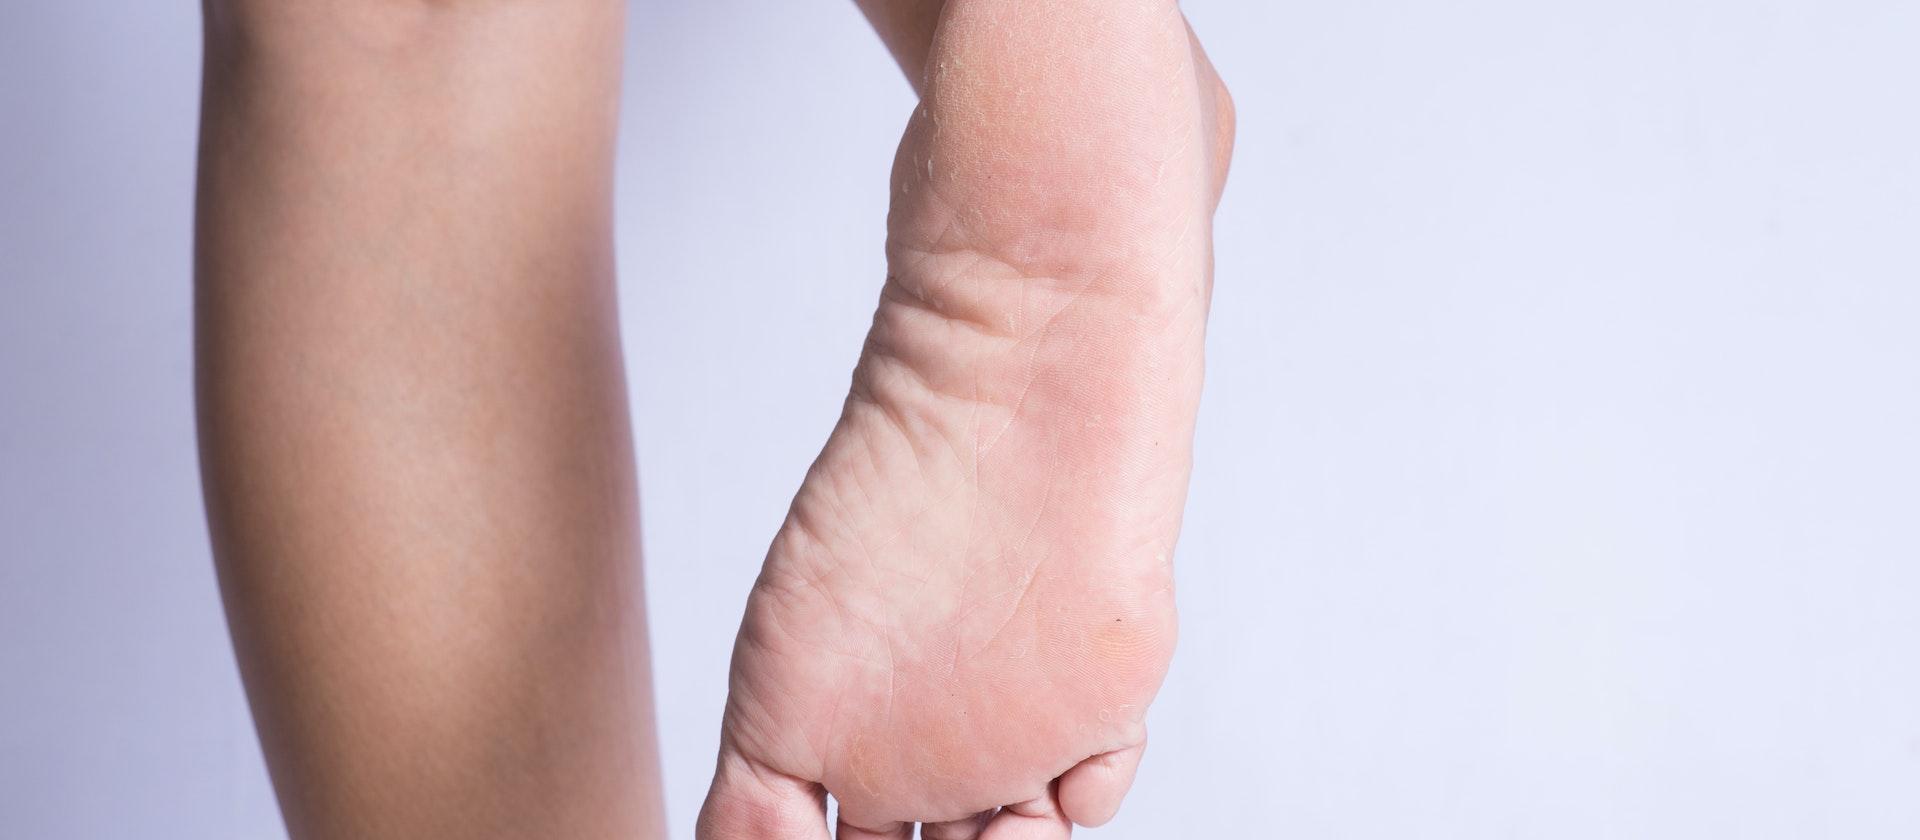 foot peeling symptoms causes treatment options buoy